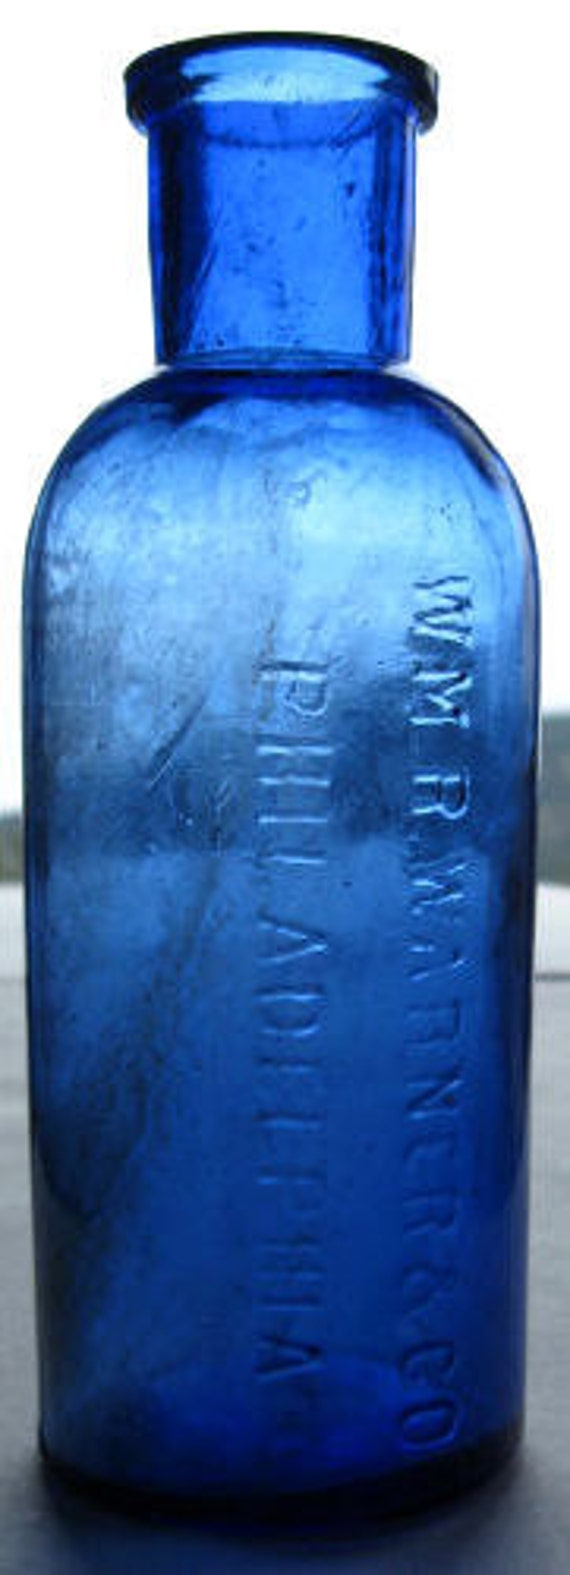 Original antique Wm WARNER quack medicine COBALT BLUE Cure bottle